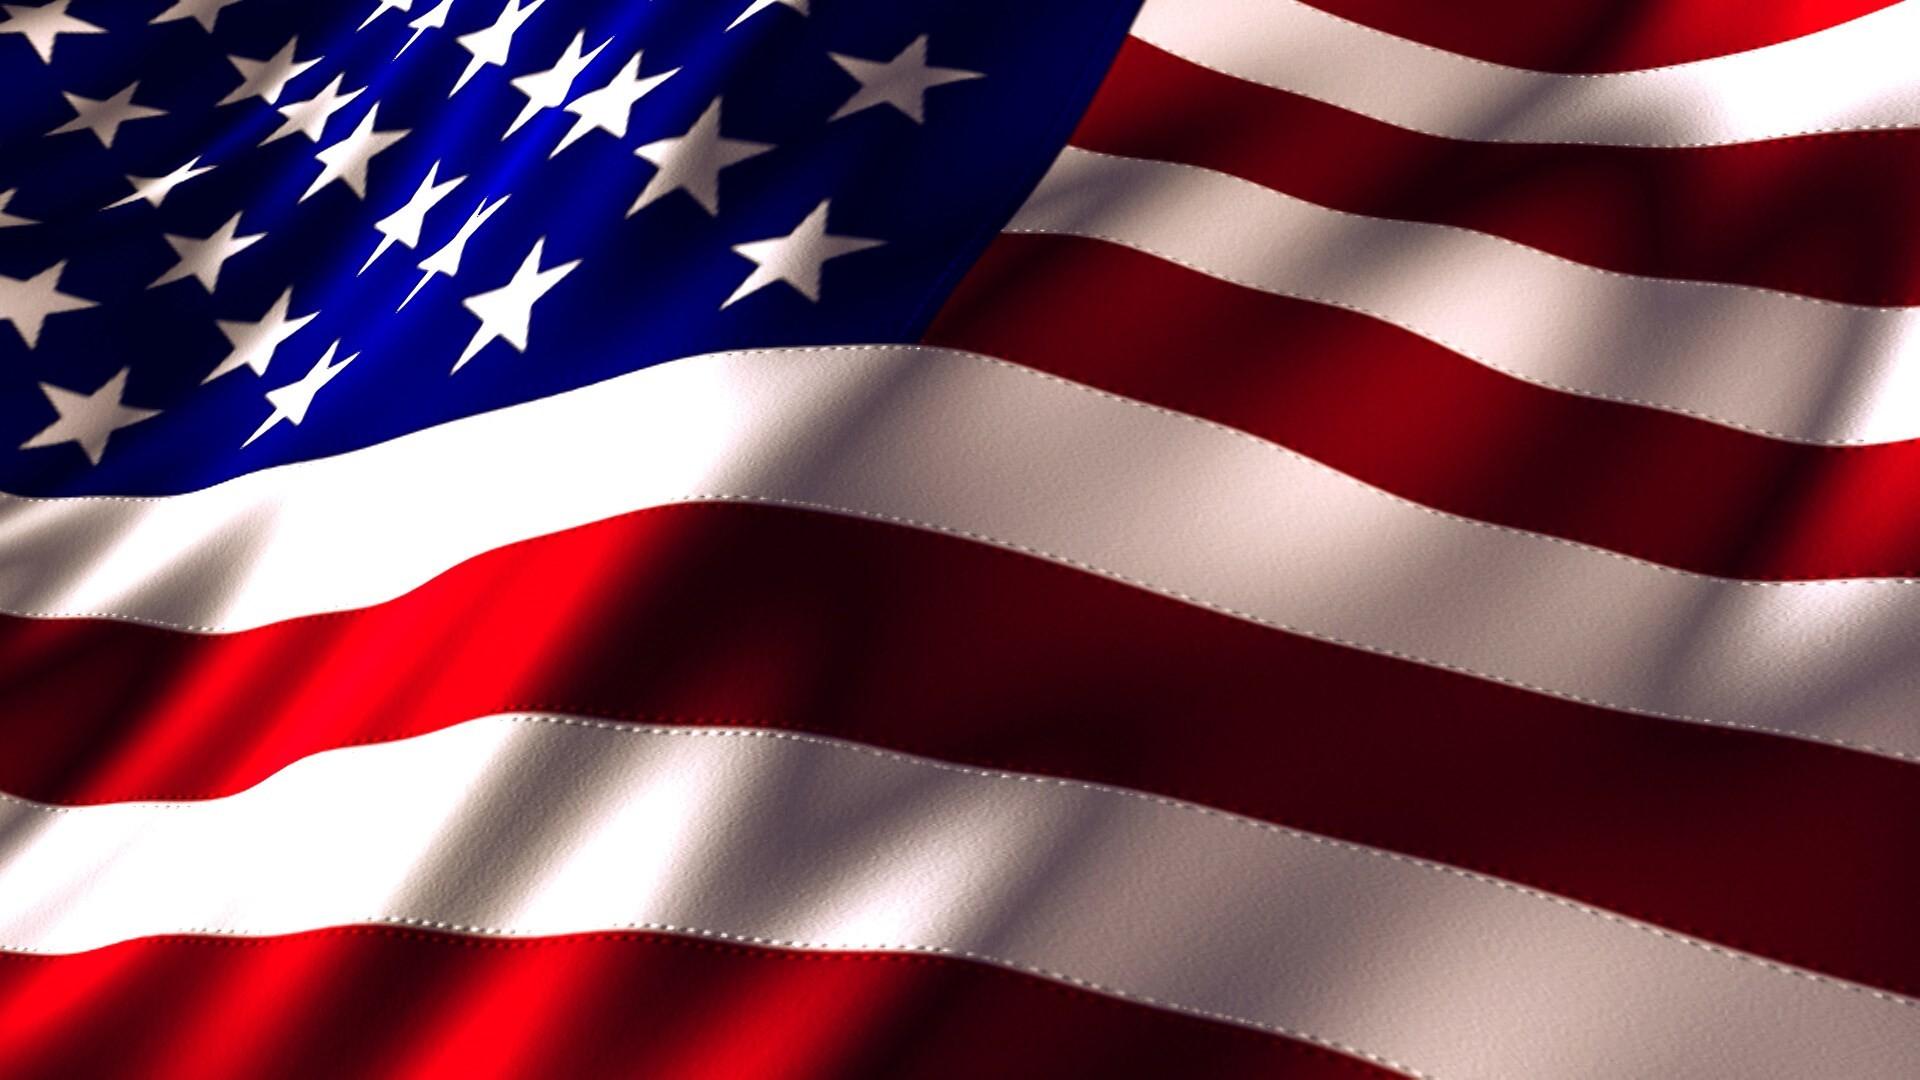 american flag hd wallpapers 1080p windows